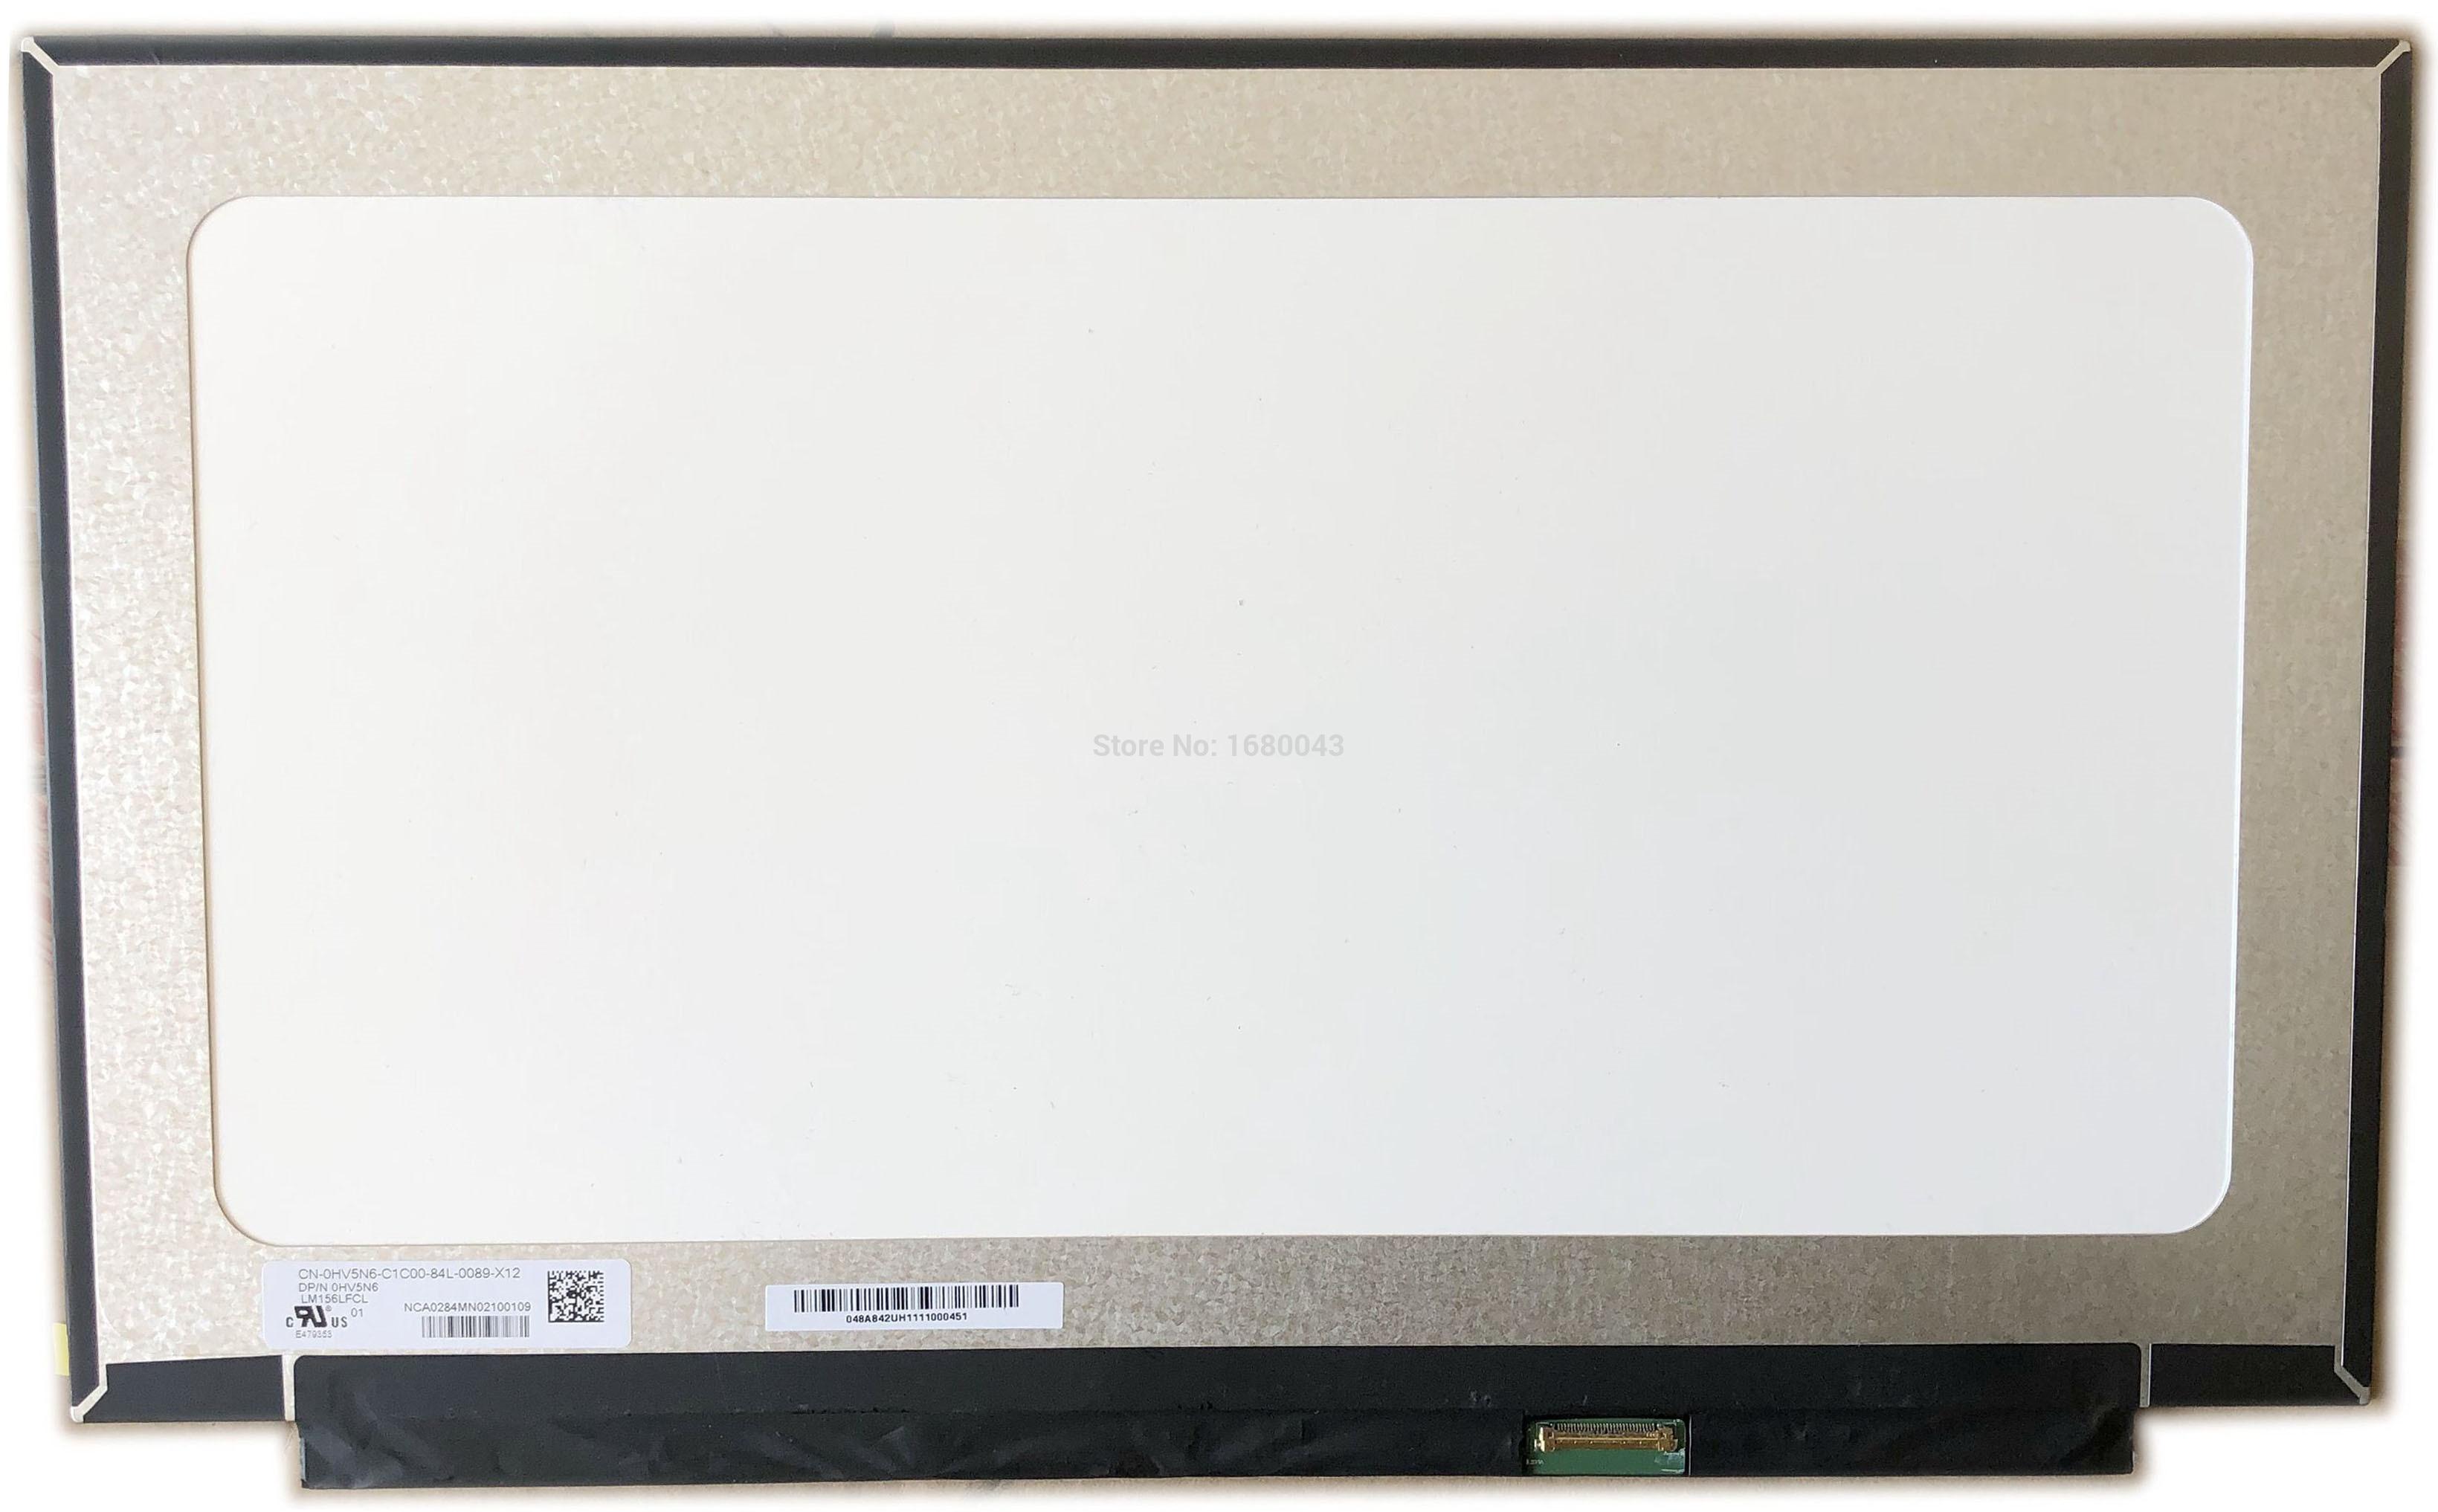 LM156LFCL LM156LFCL01 15.6 LCD LED SCREEN PANEL EDP 1920X1080 IPS